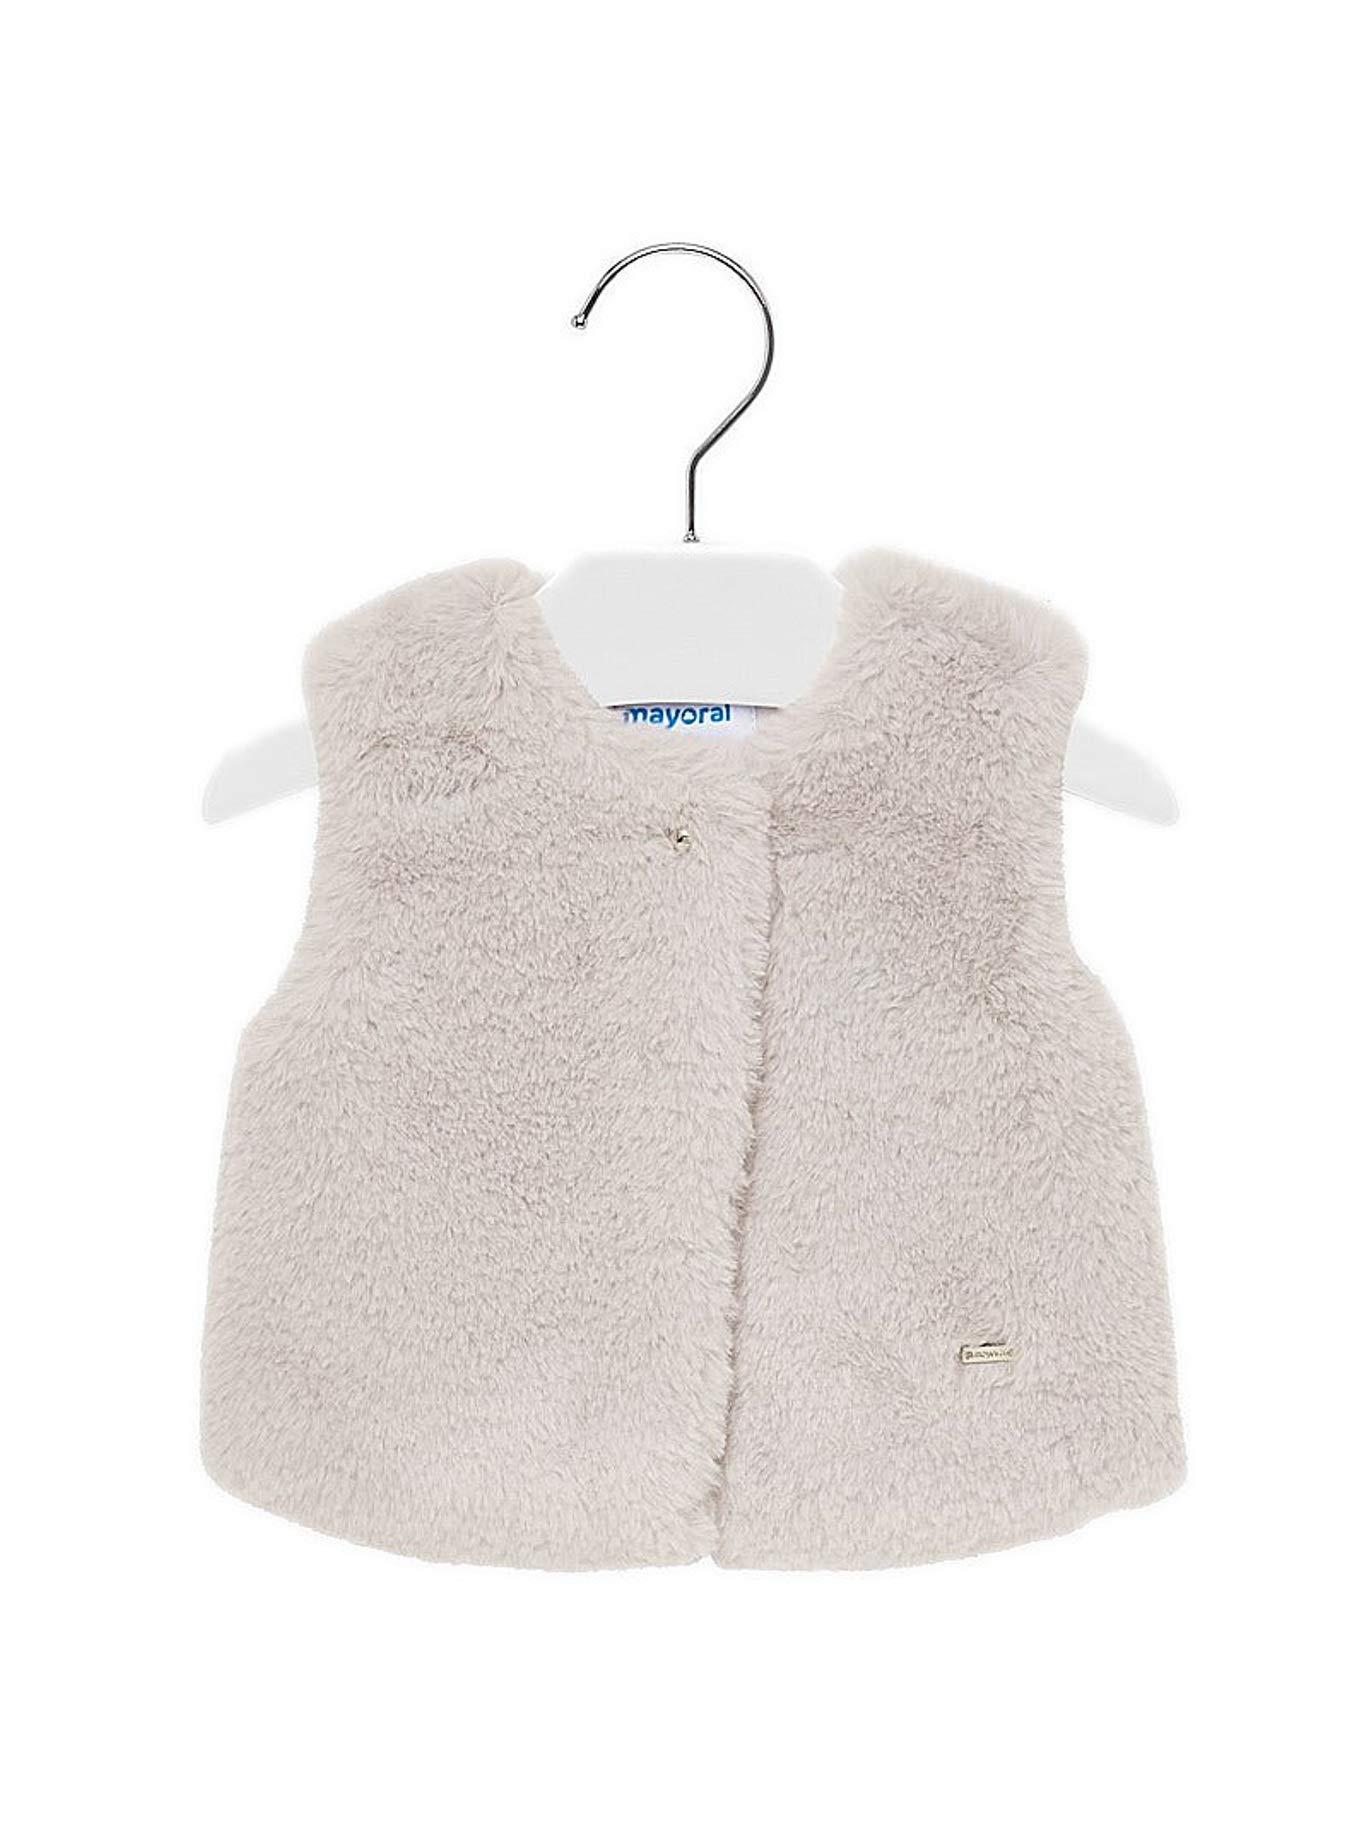 Mayoral 19-02317-075 - Fur Vest for Baby-Girls 12 Months Beige by Mayoral